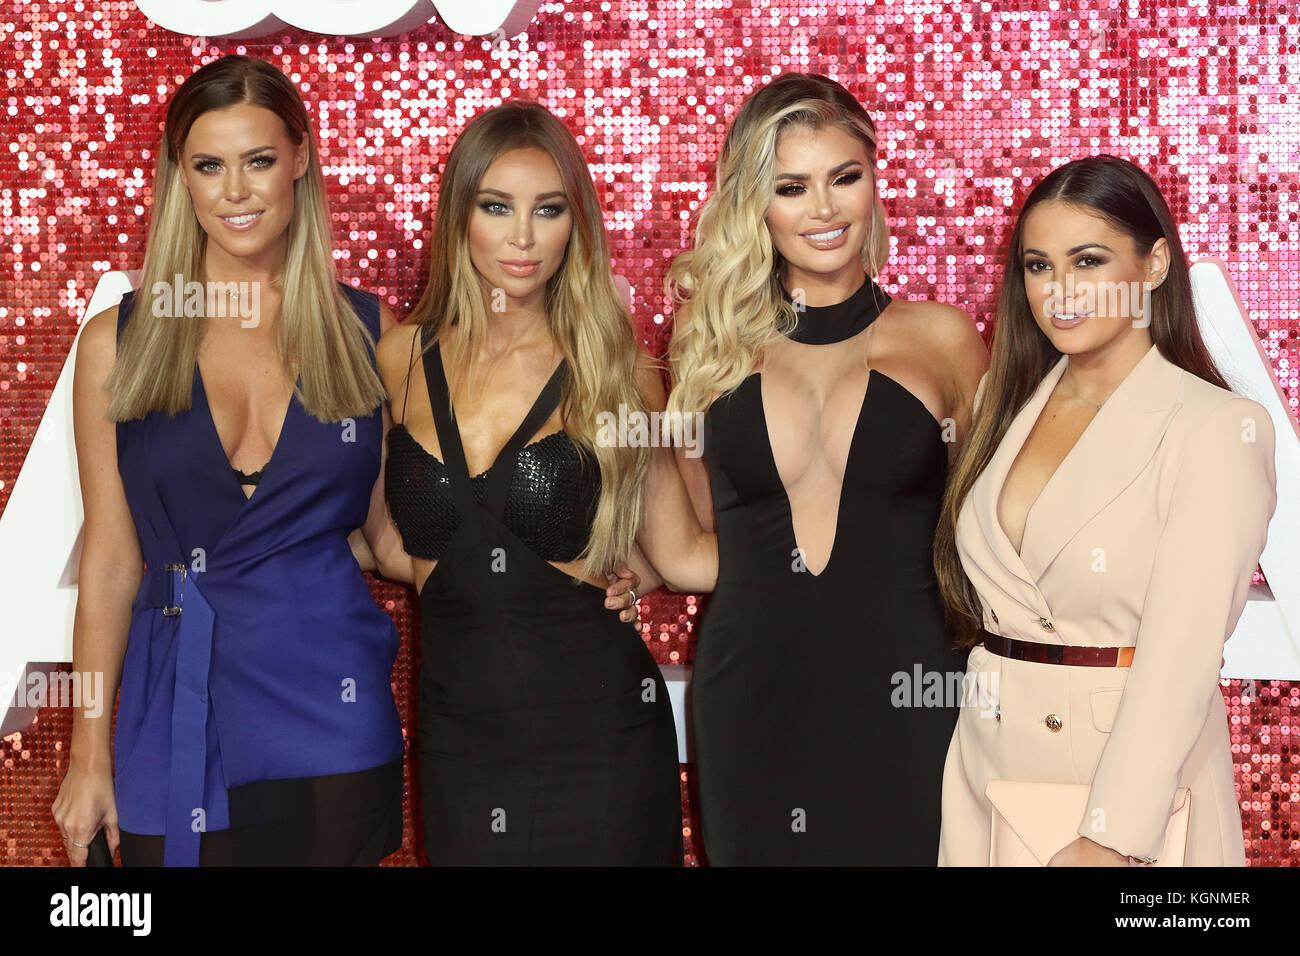 London, UK. 9th November, 2017. Towie, Chloe Meadows, Lauren Pope, Chloe Sims, Courtney Green, ITV GALA, London - Stock Image